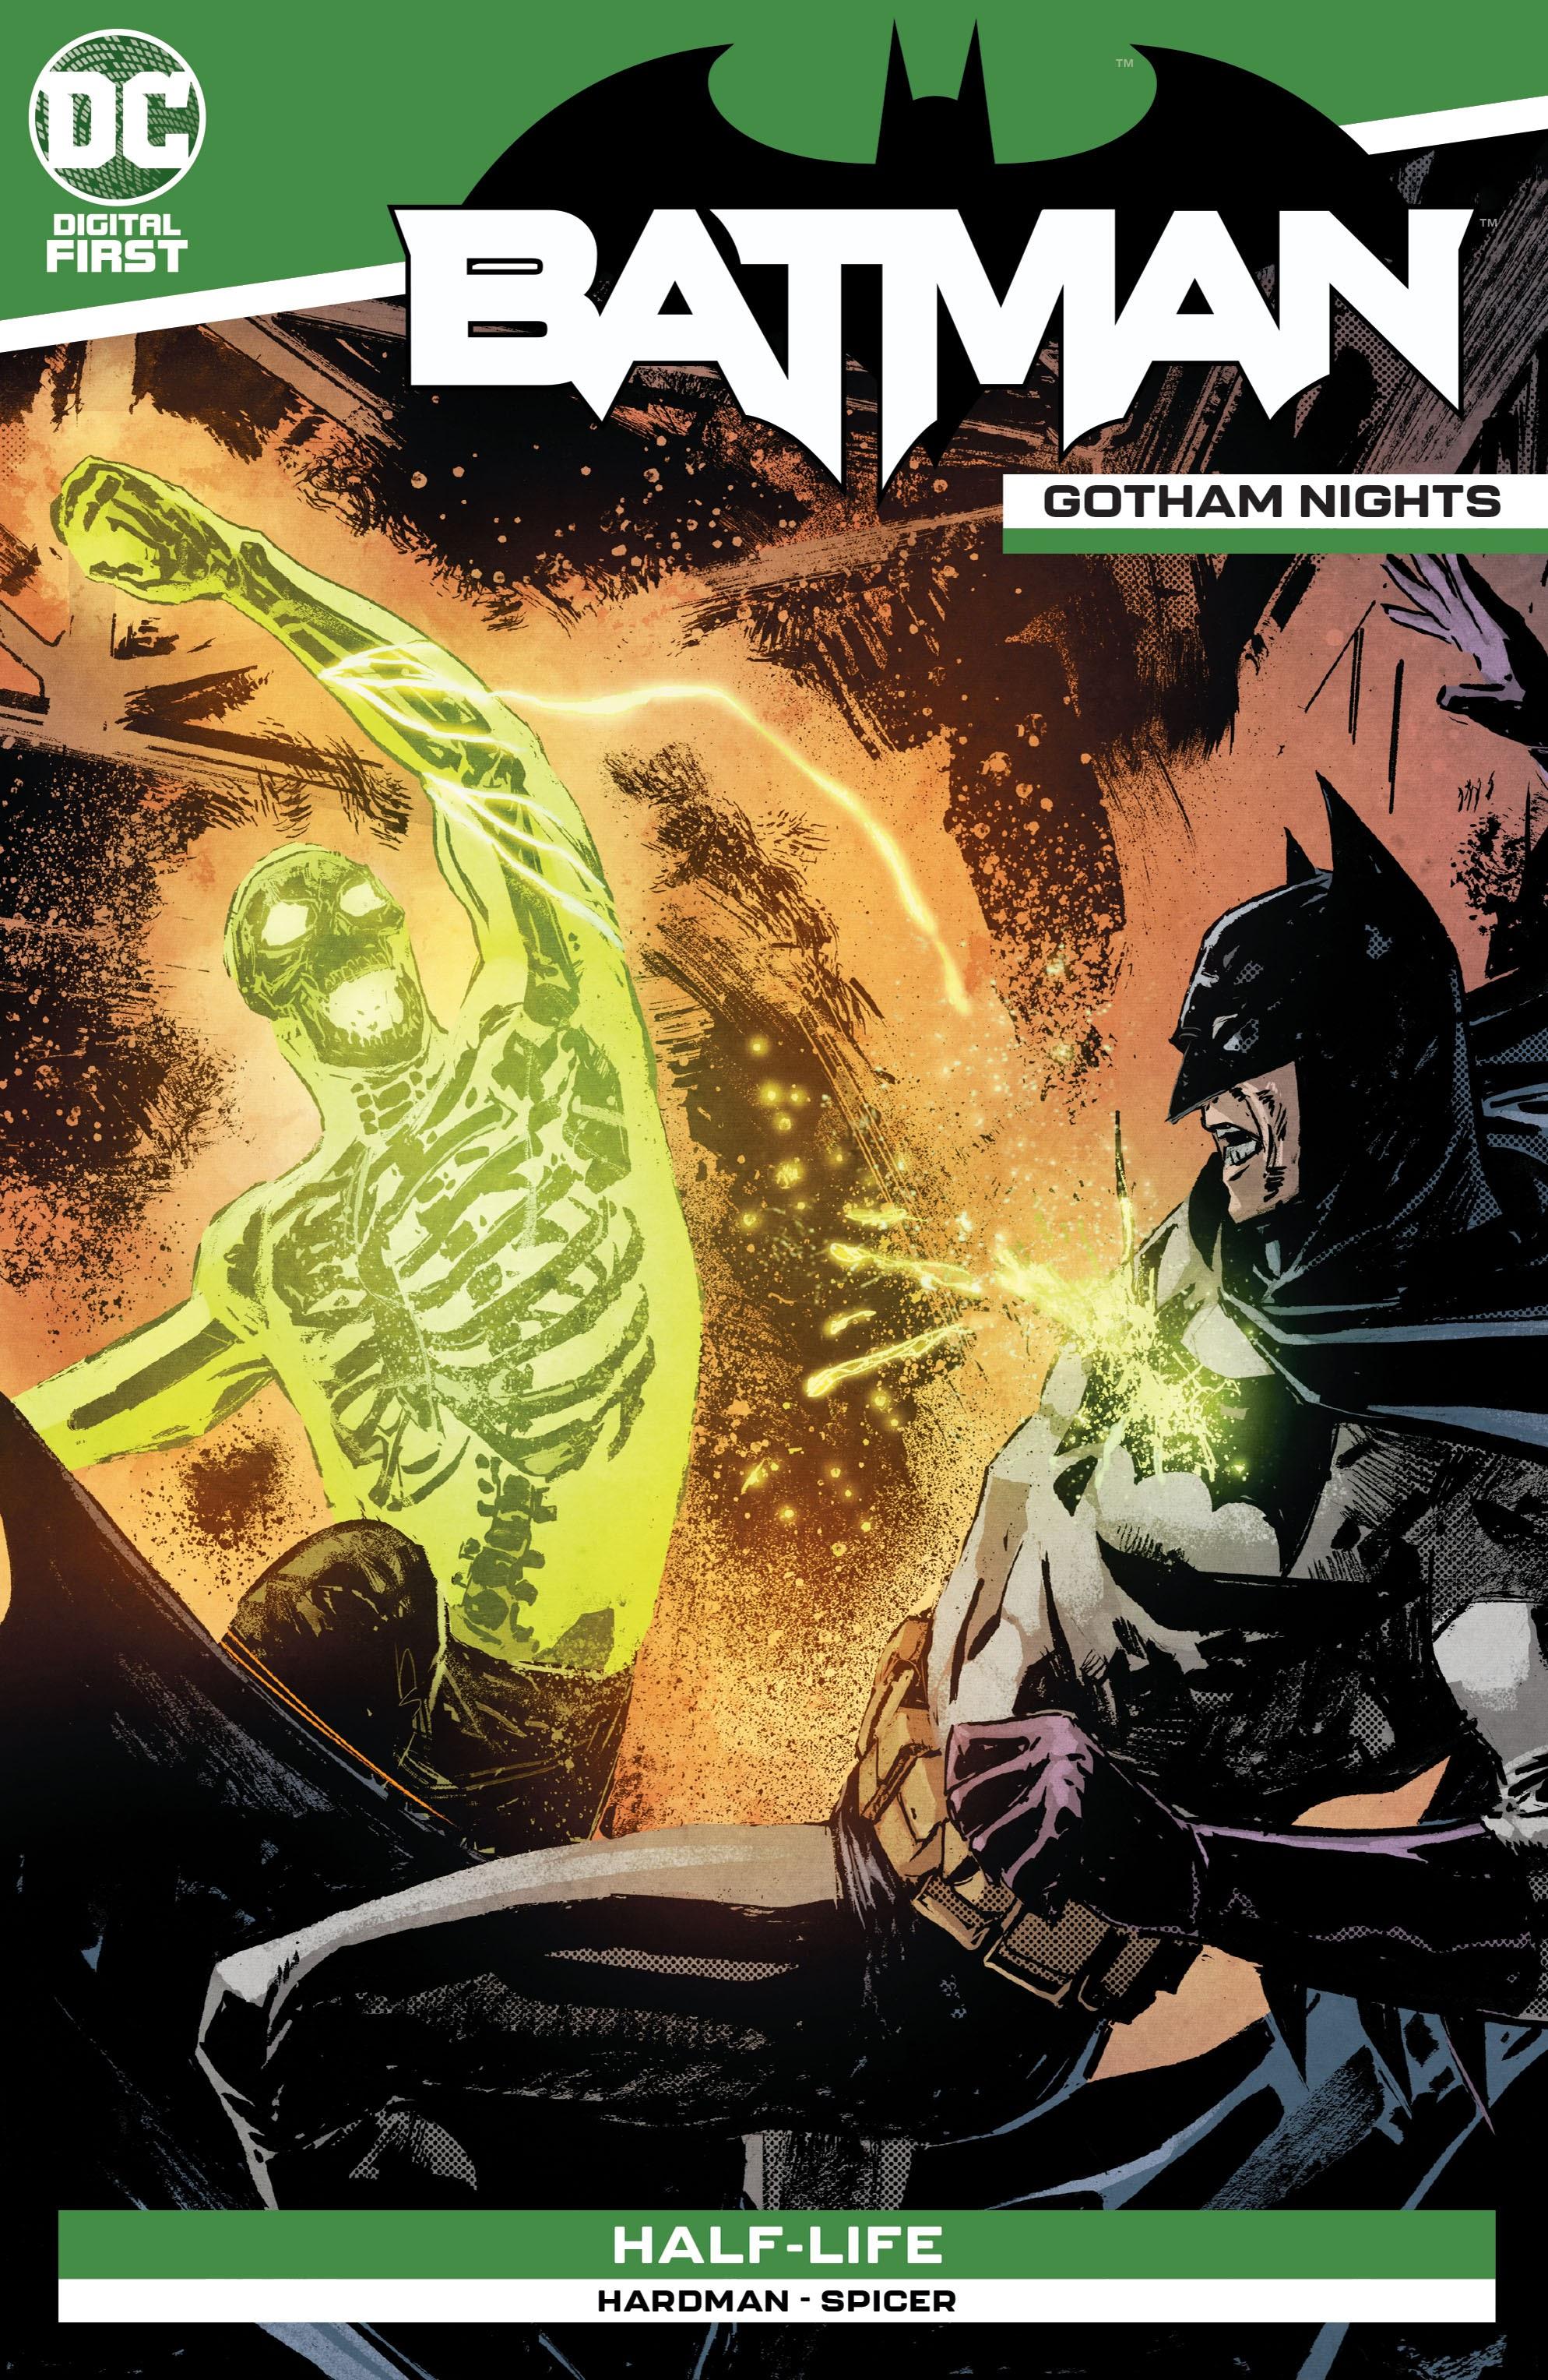 Batman: Gotham Nights Vol 1 19 (Digital)